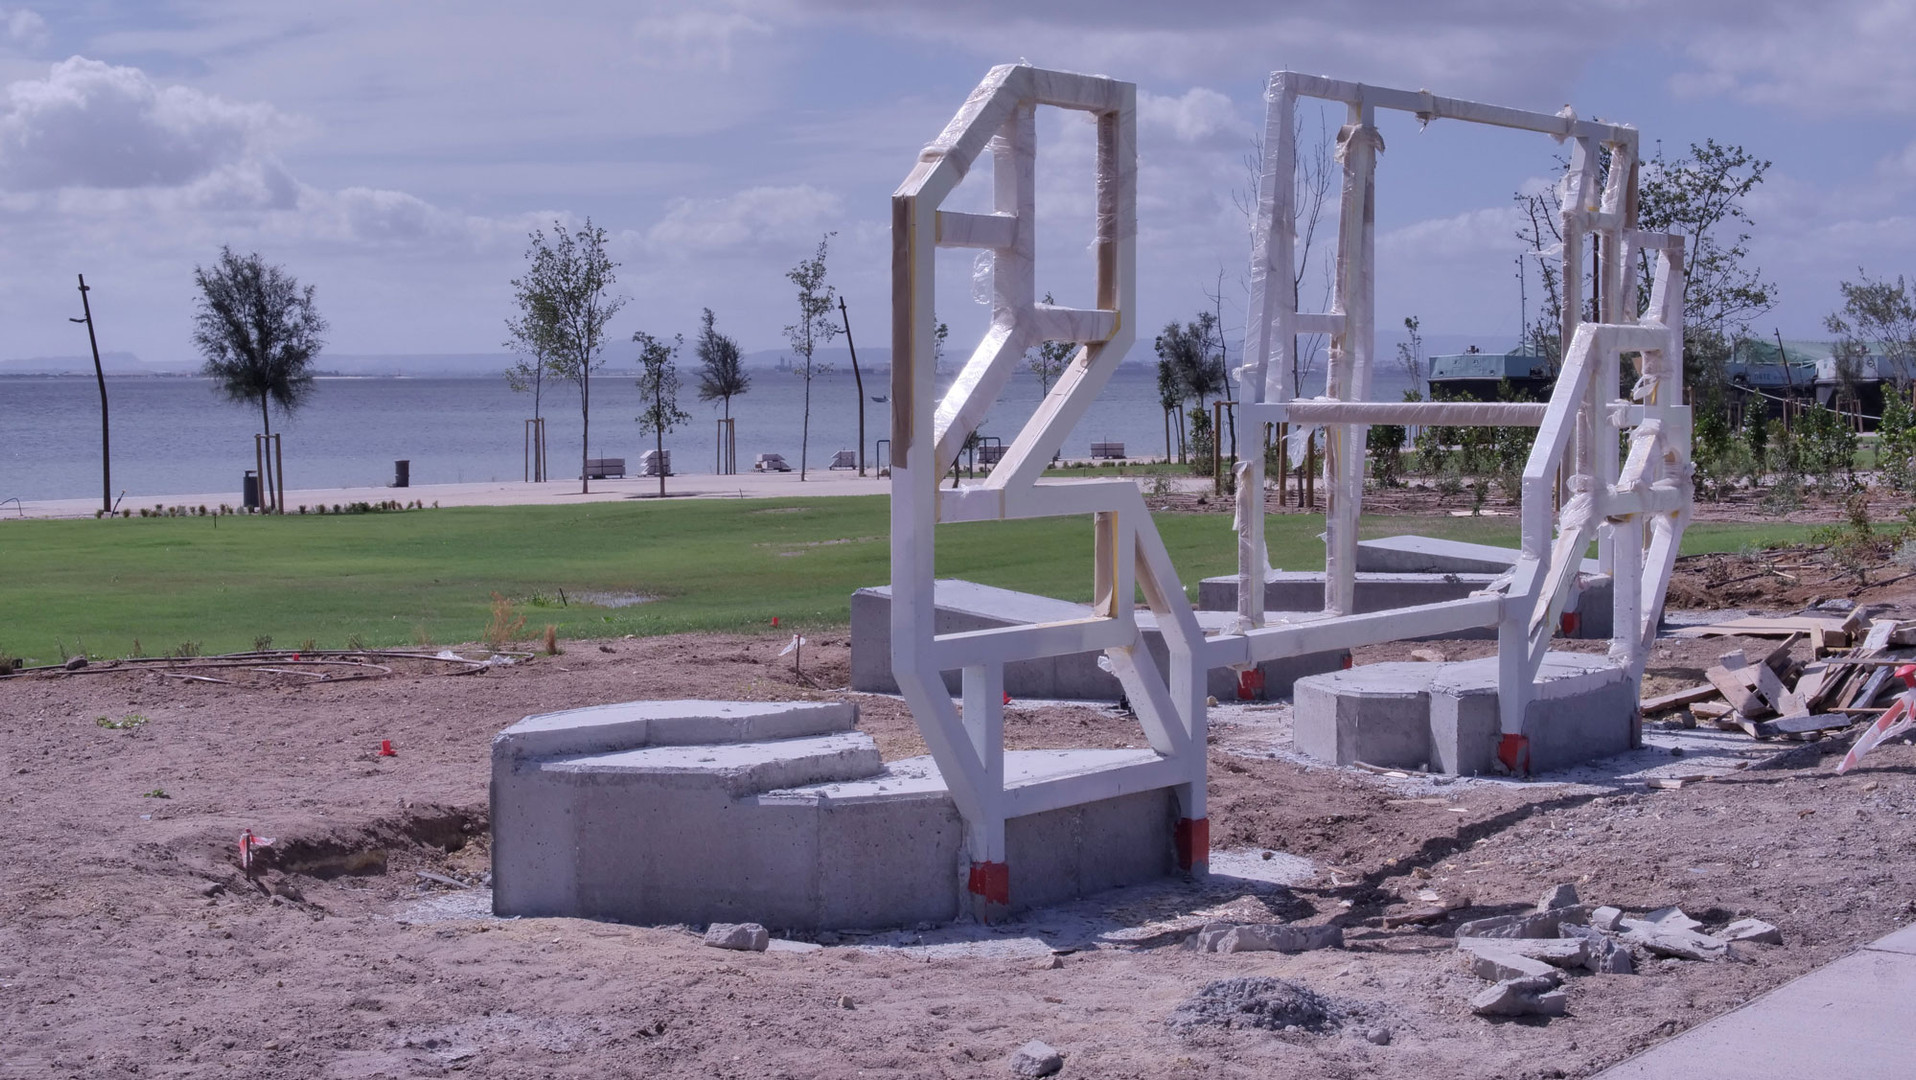 escultura-solar-1a.jpg